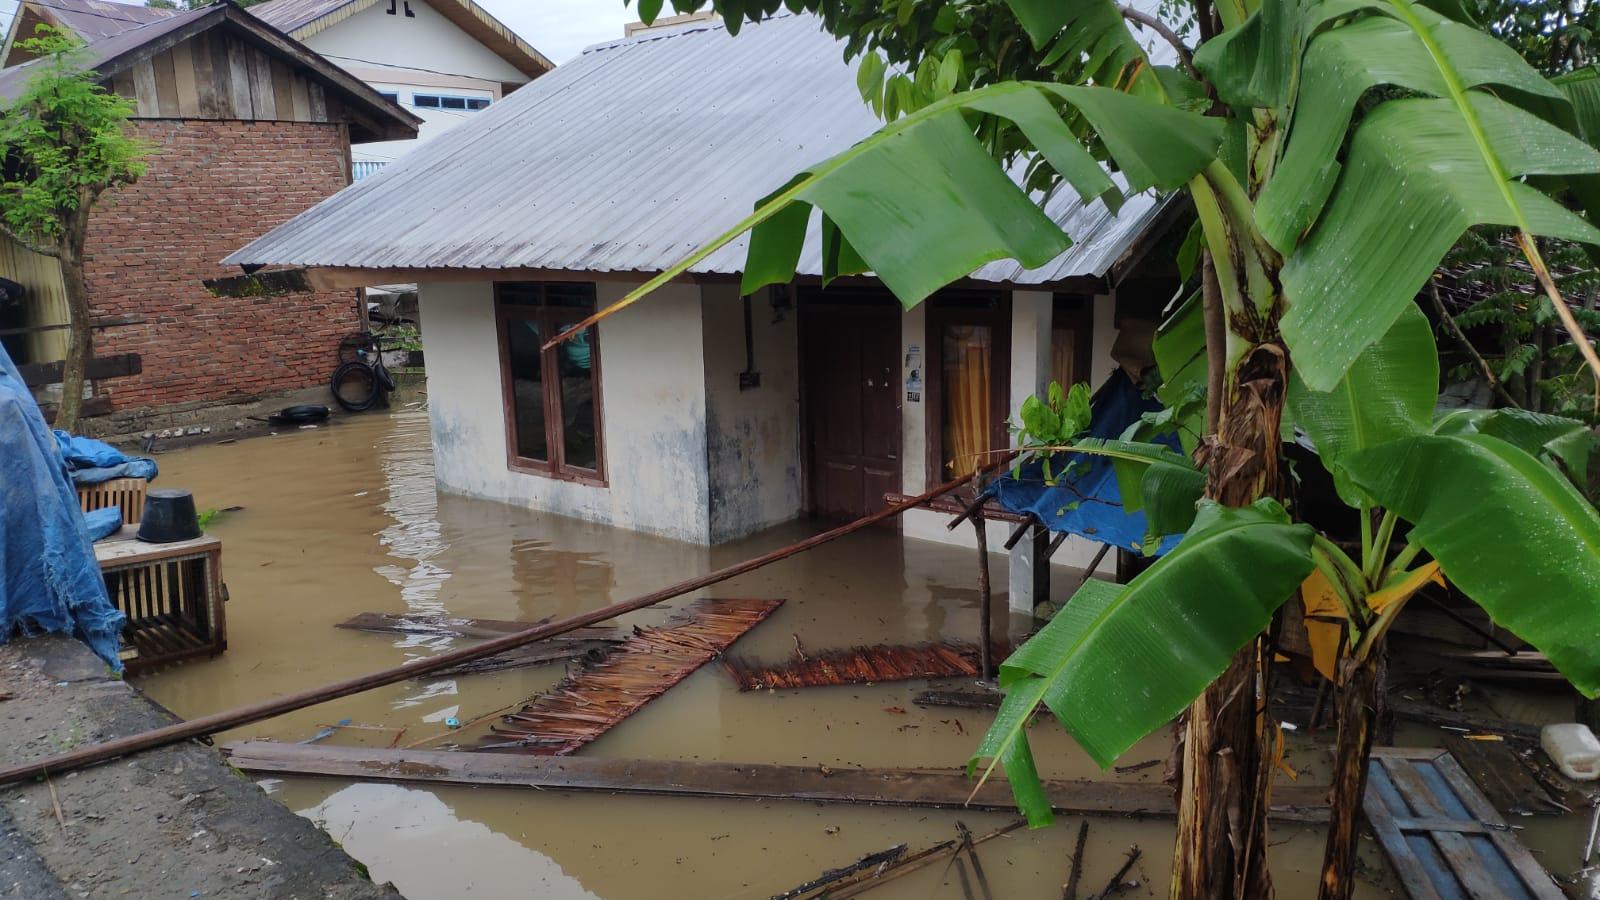 https: img.okezone.com content 2021 08 11 340 2454170 banjir-melanda-sejumlah-wilayah-aceh-besar-dan-aceh-jaya-ratusan-warga-mengungsi-b7hz9ATs8x.jpeg